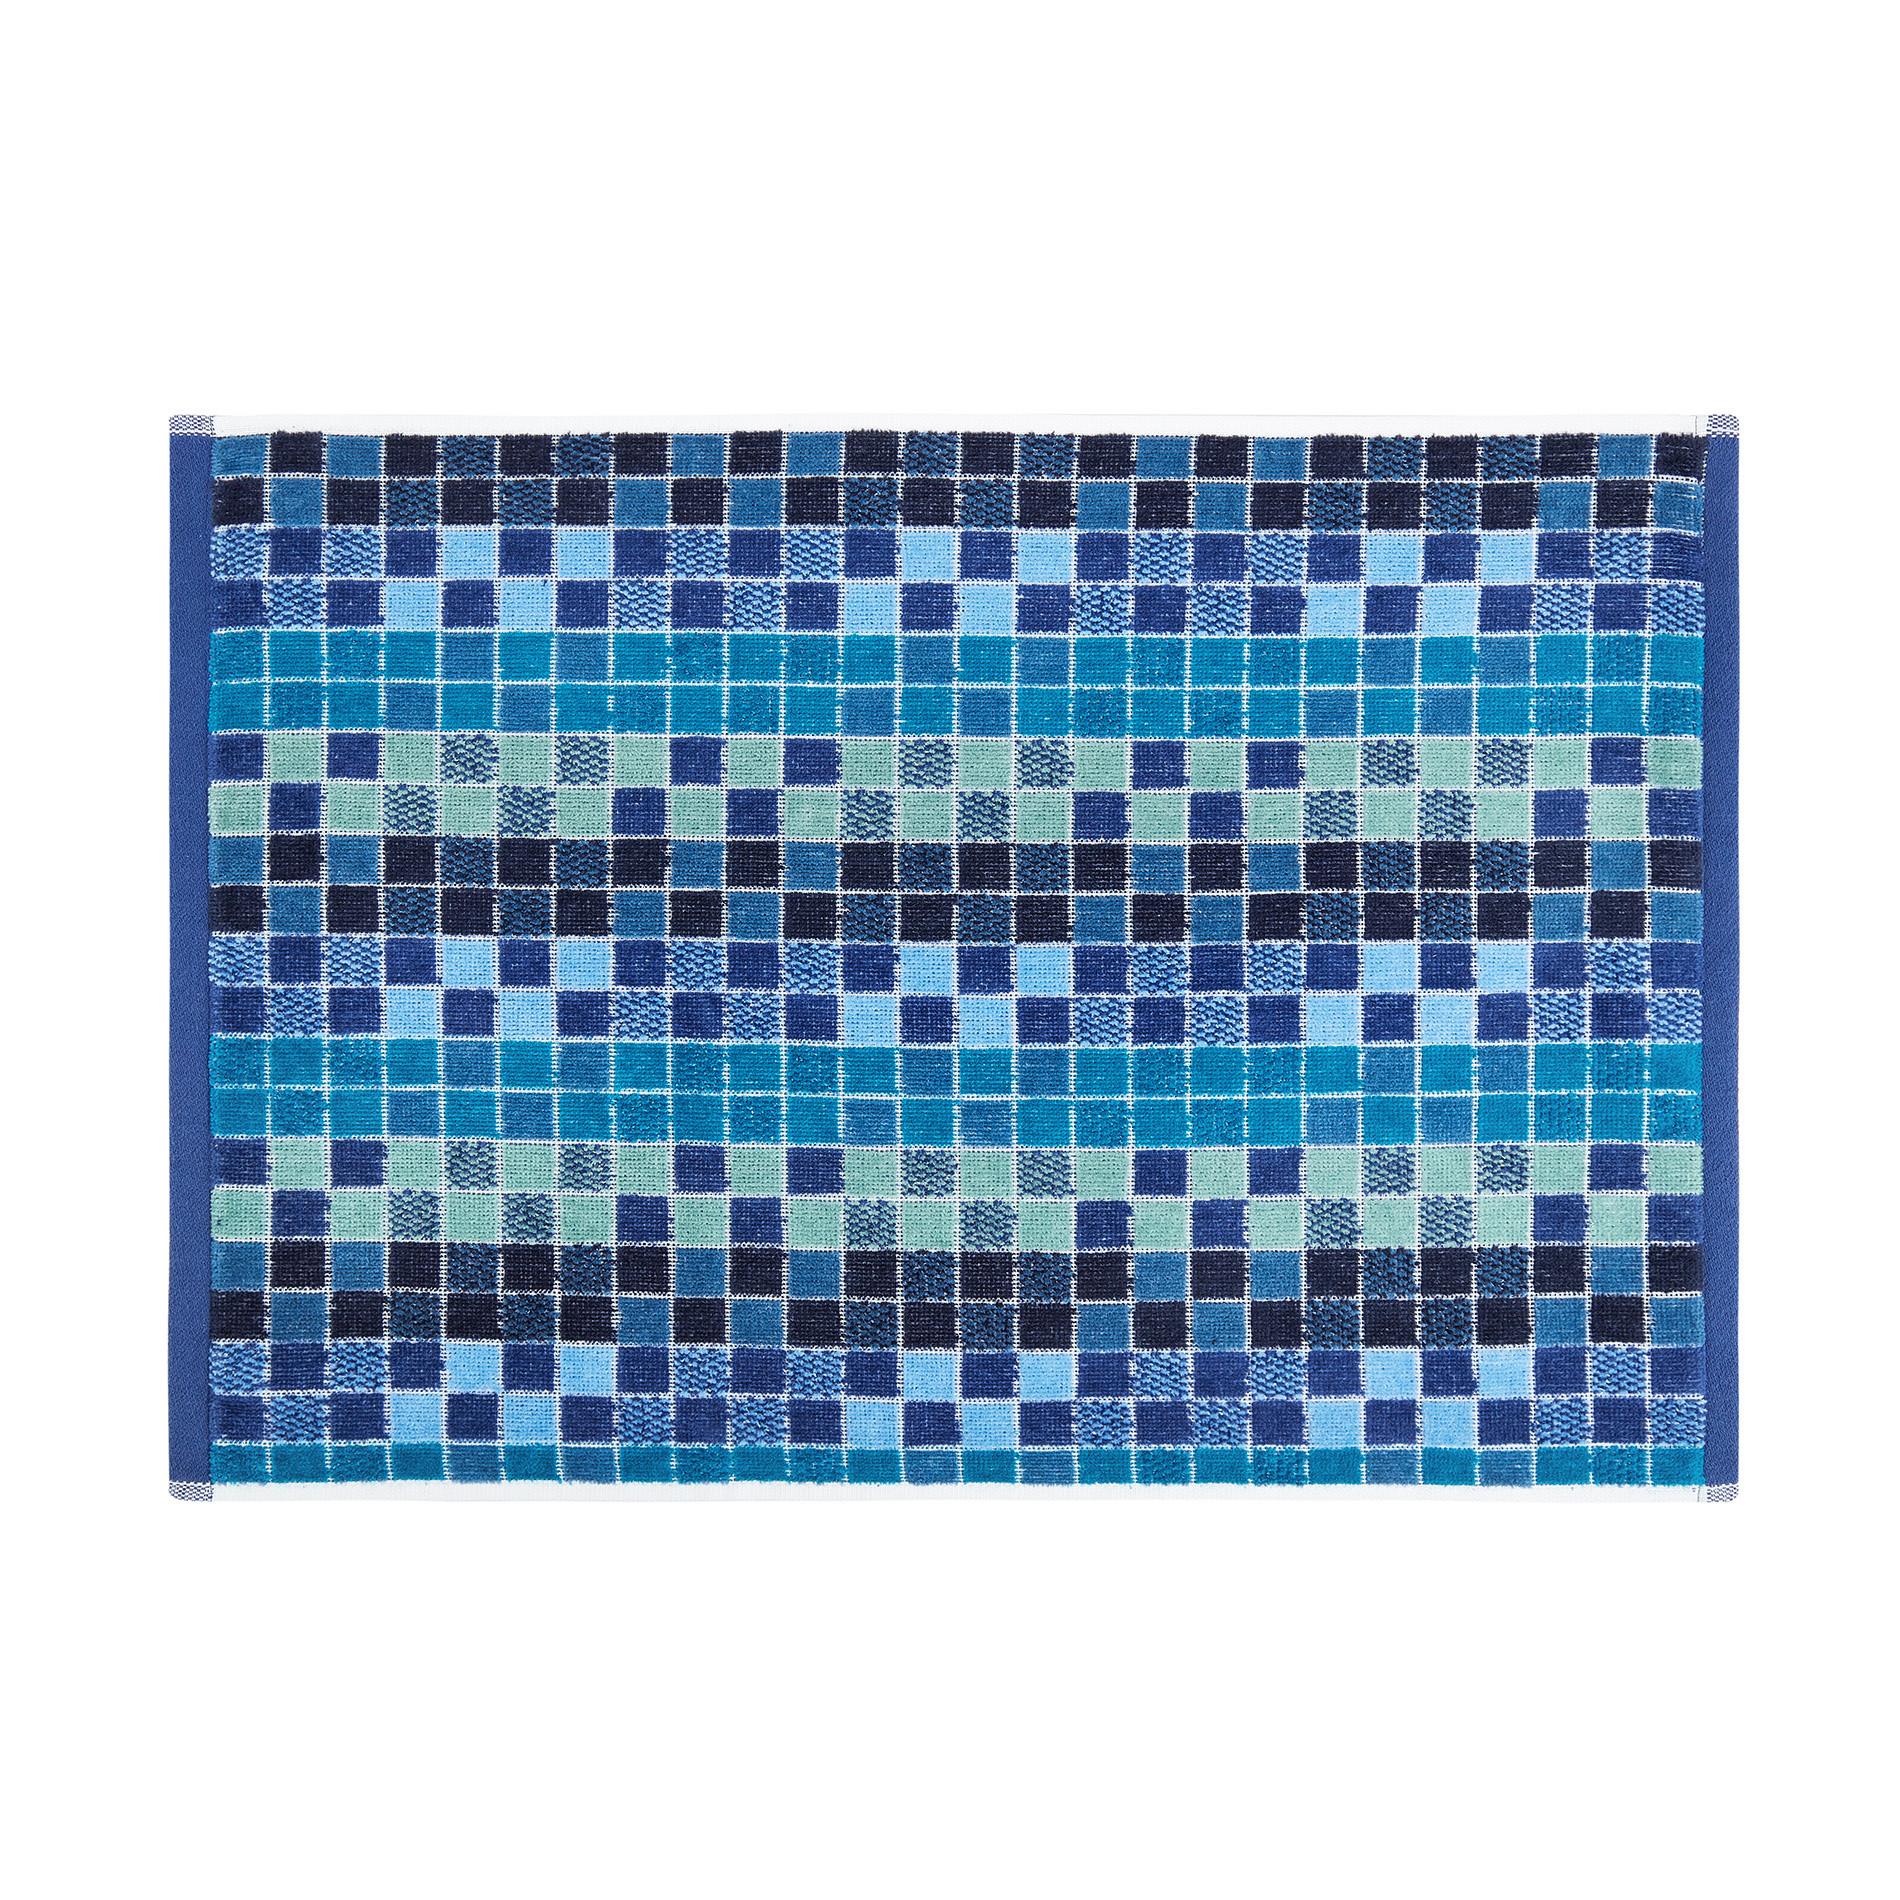 Asciugamano cotone velour fantasia mosaico, Blu, large image number 2